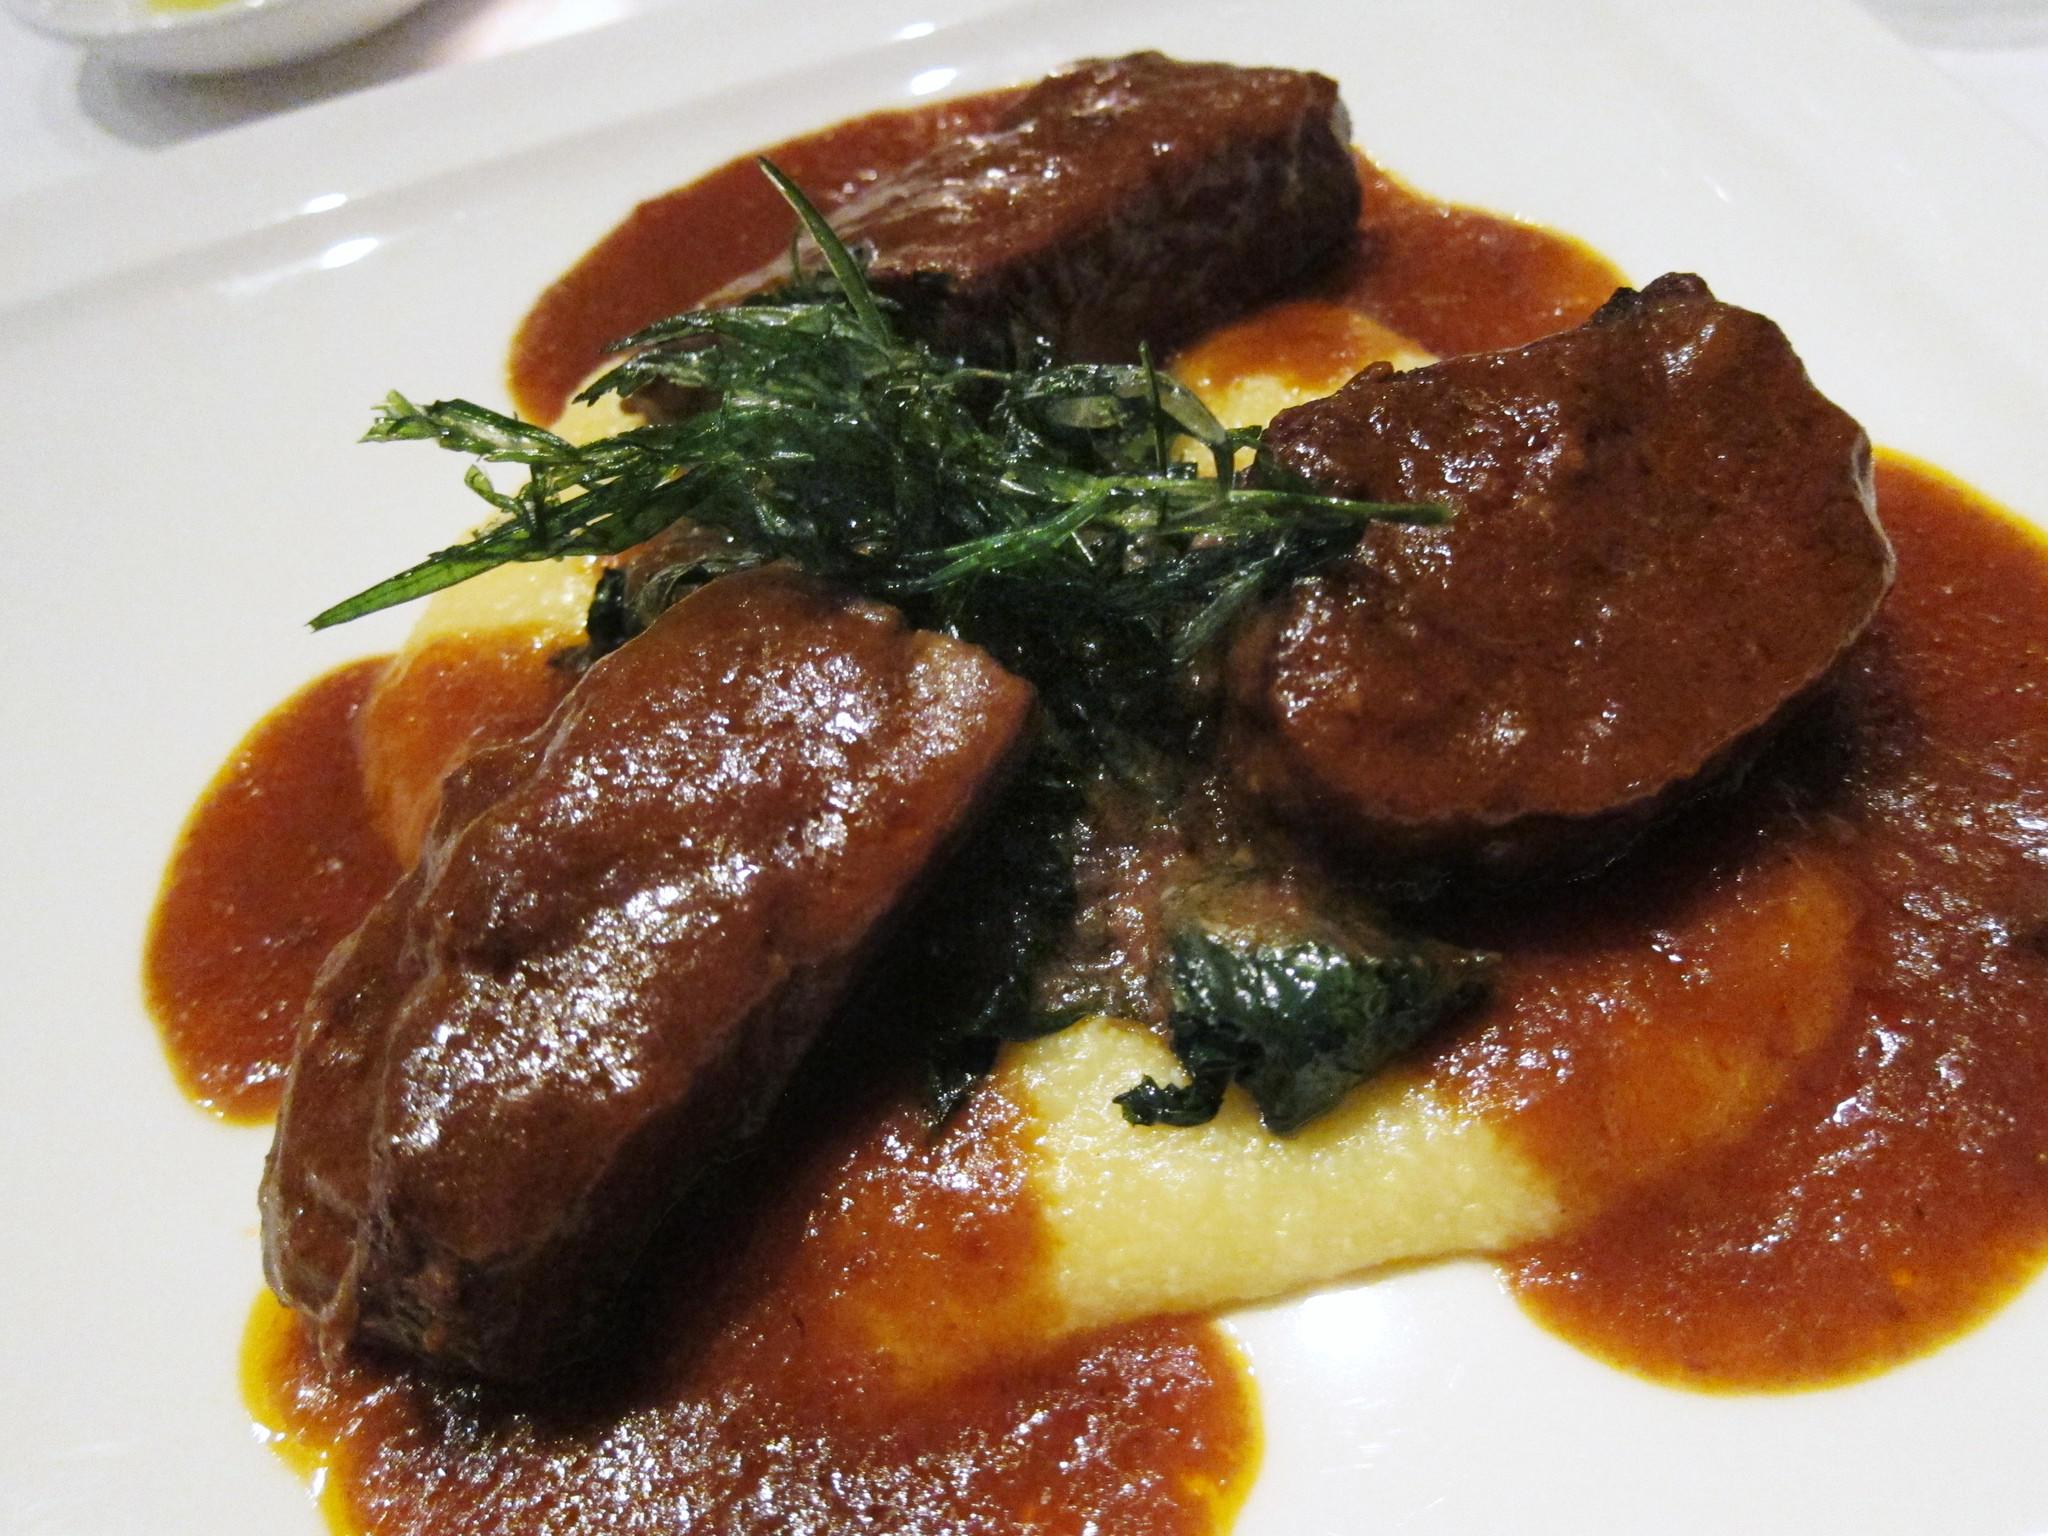 Short ribs with organic polenta and swiss chard, at Coco Pazzo.